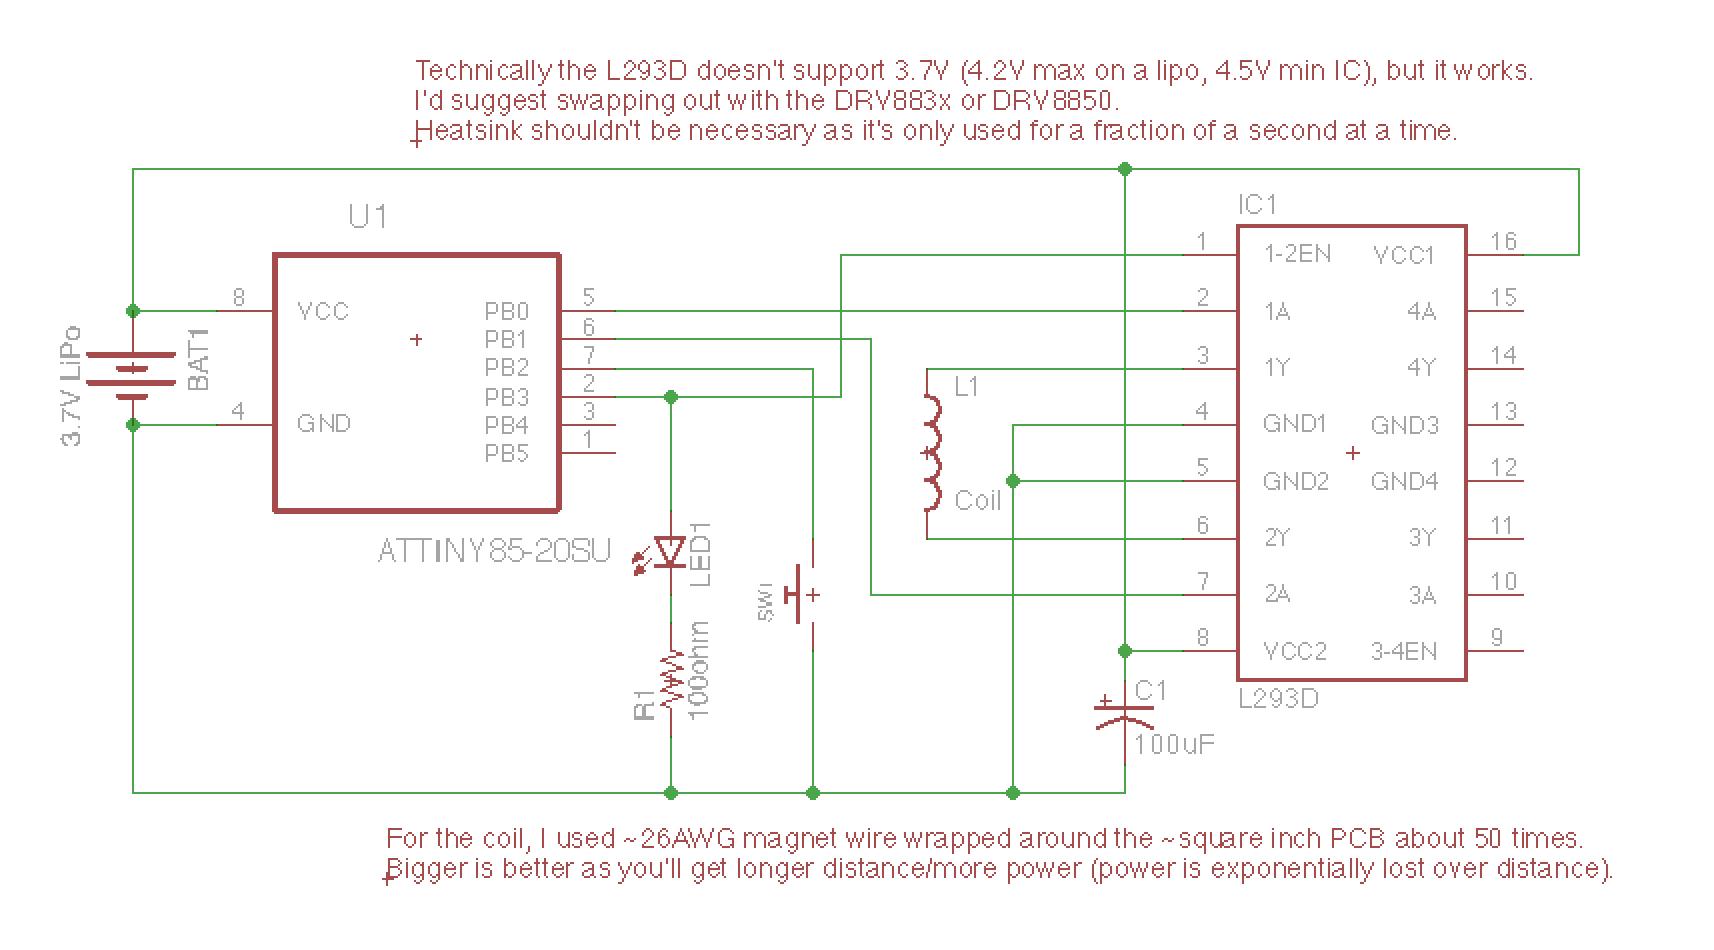 Miraculous Smart Card Wiring Diagram Wiring Diagram Library Wiring Cloud Licukshollocom